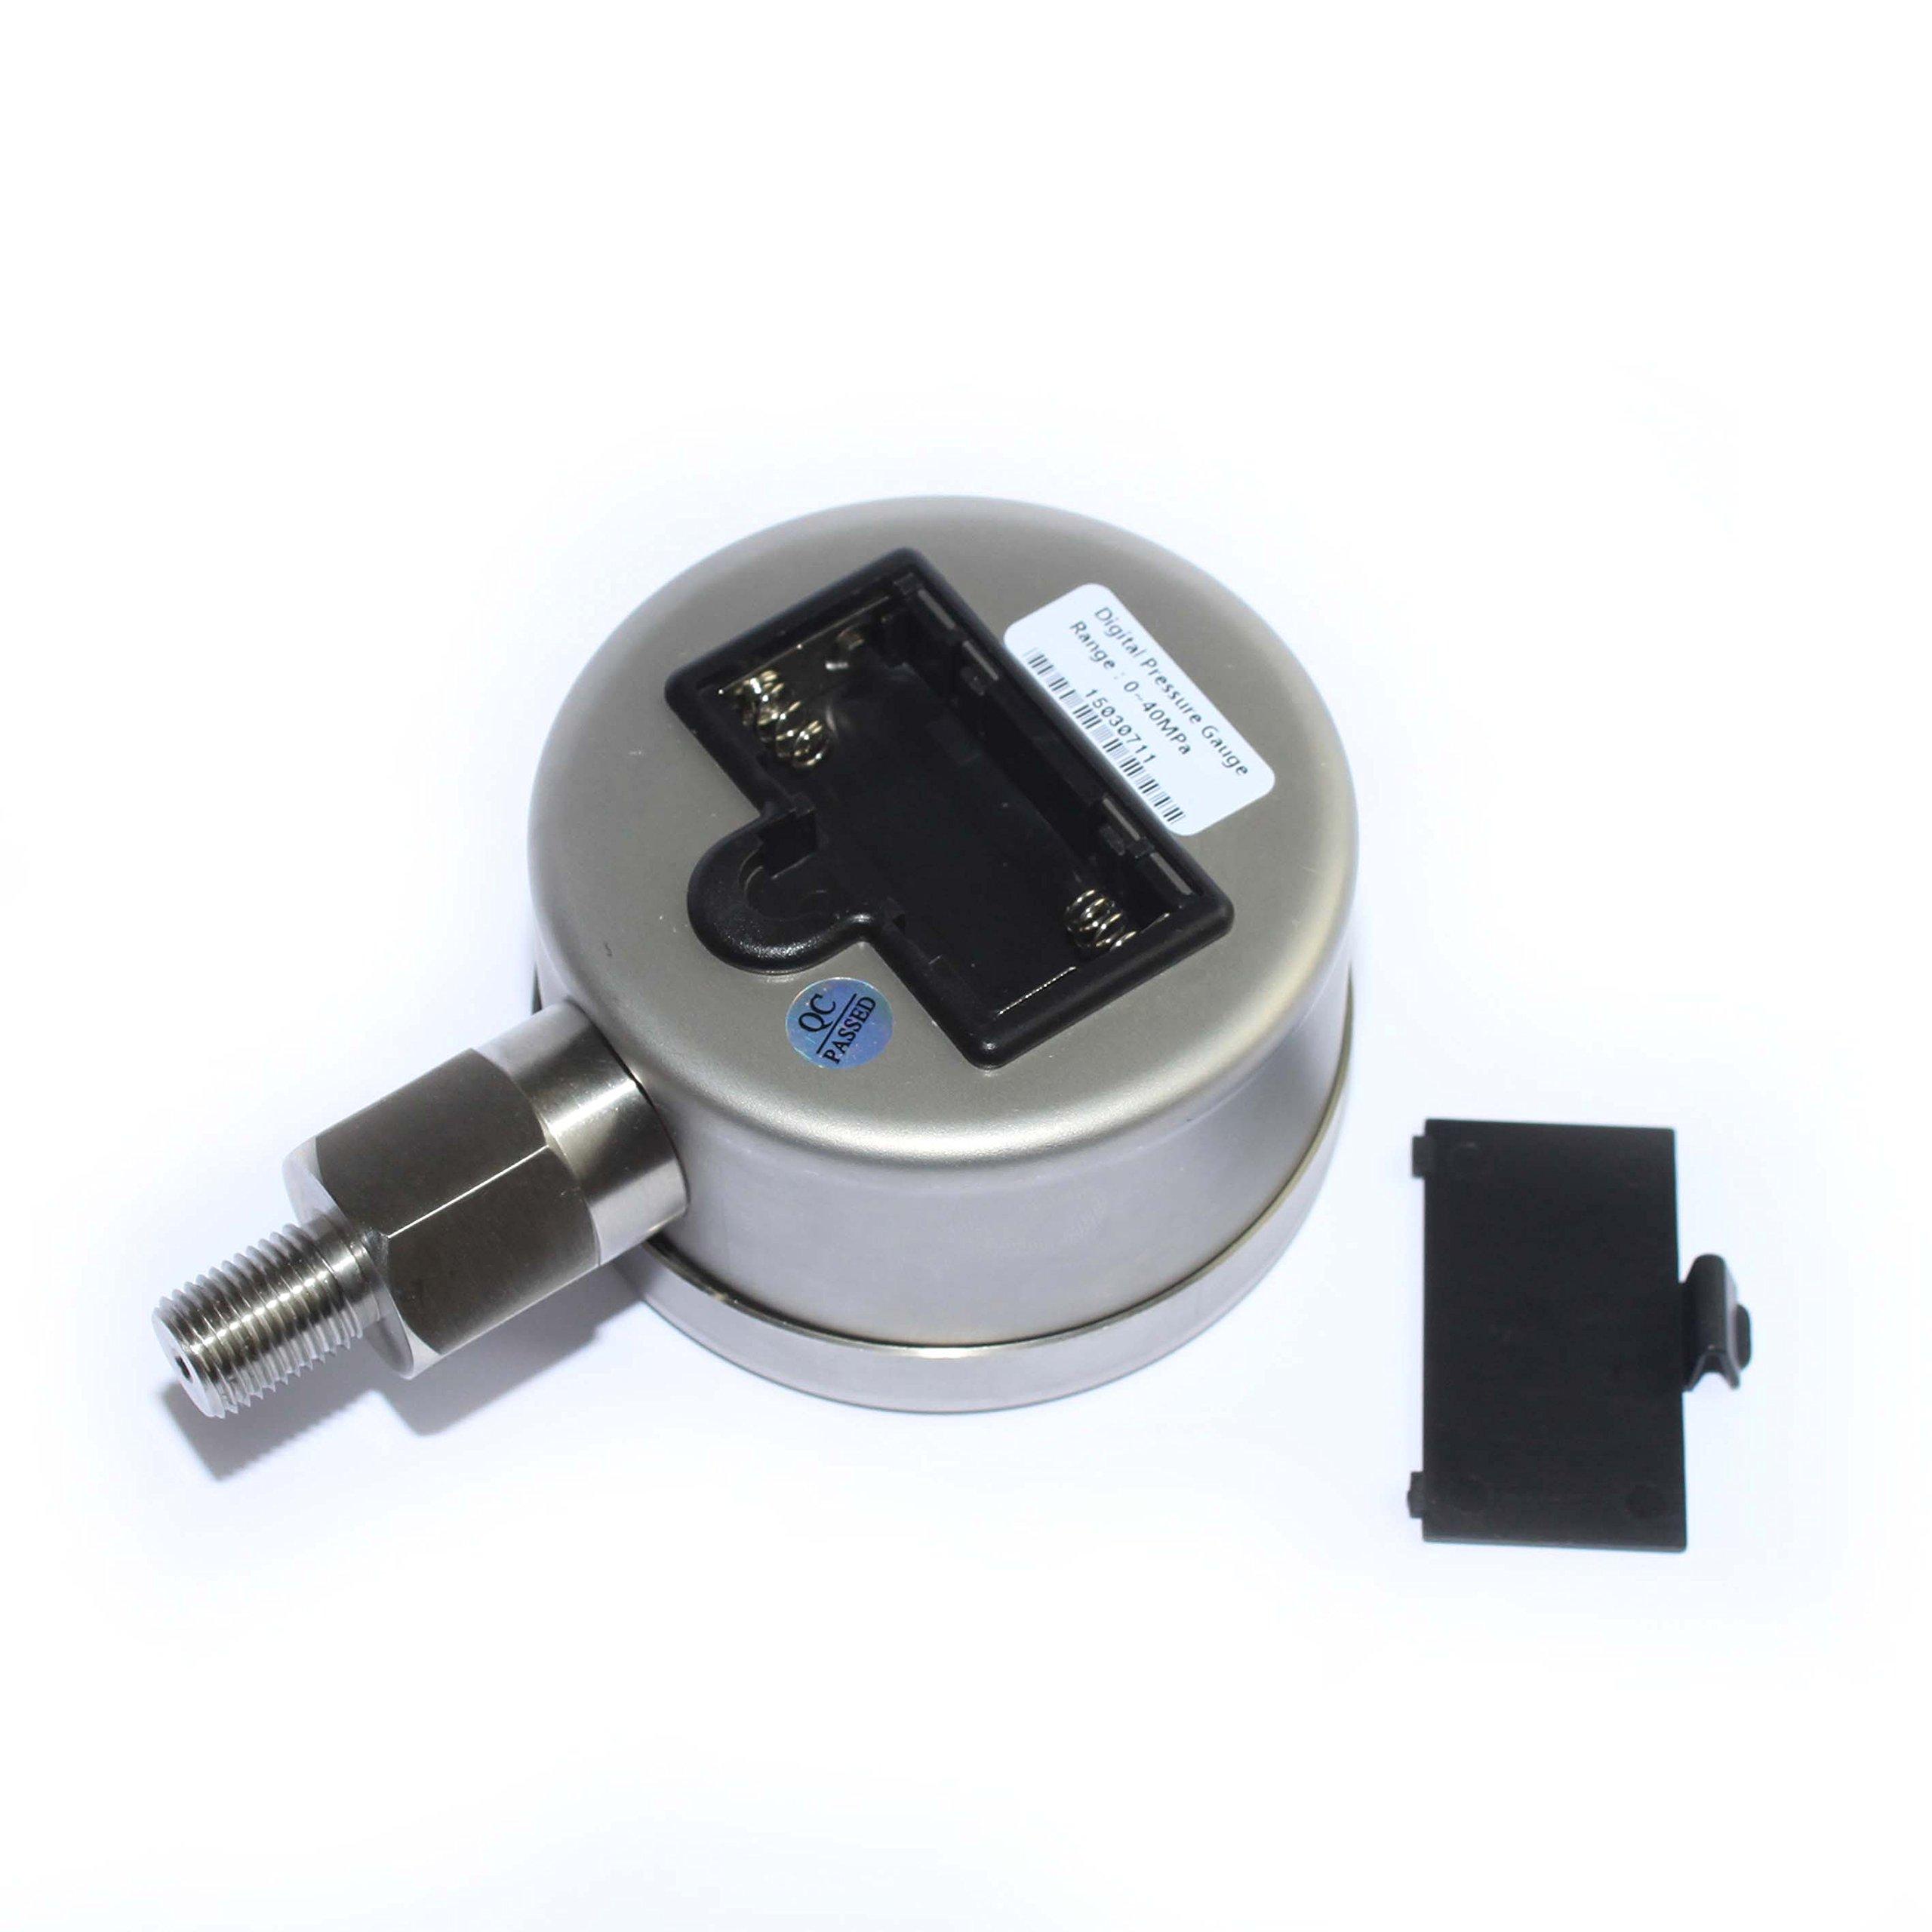 XZT Digital Hydraulic Pressure Gauge 10000psi/700bar-1/4npt-base Entry by XZT (Image #2)